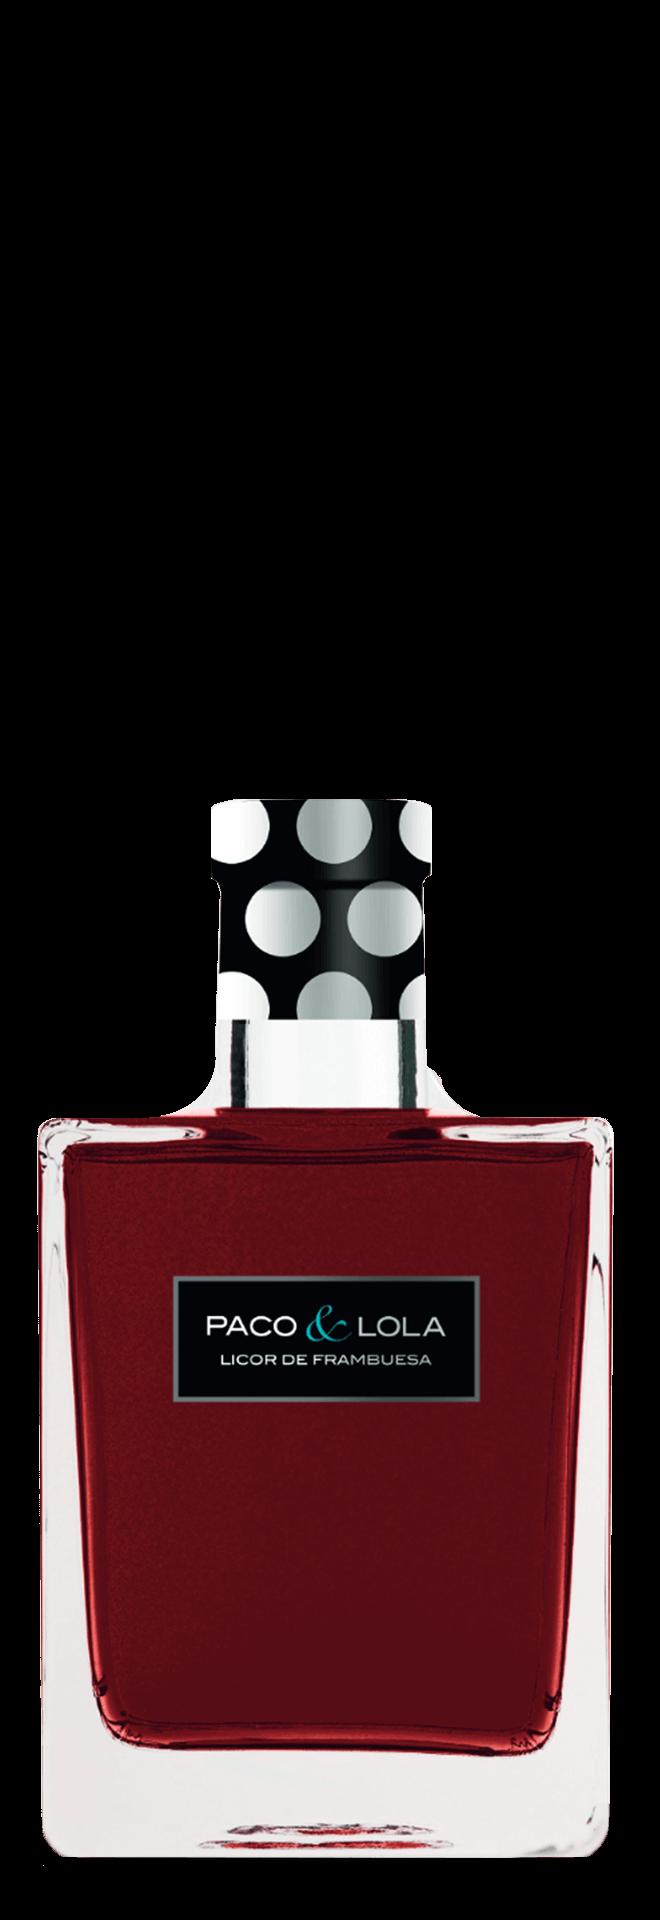 licor de frambuesa